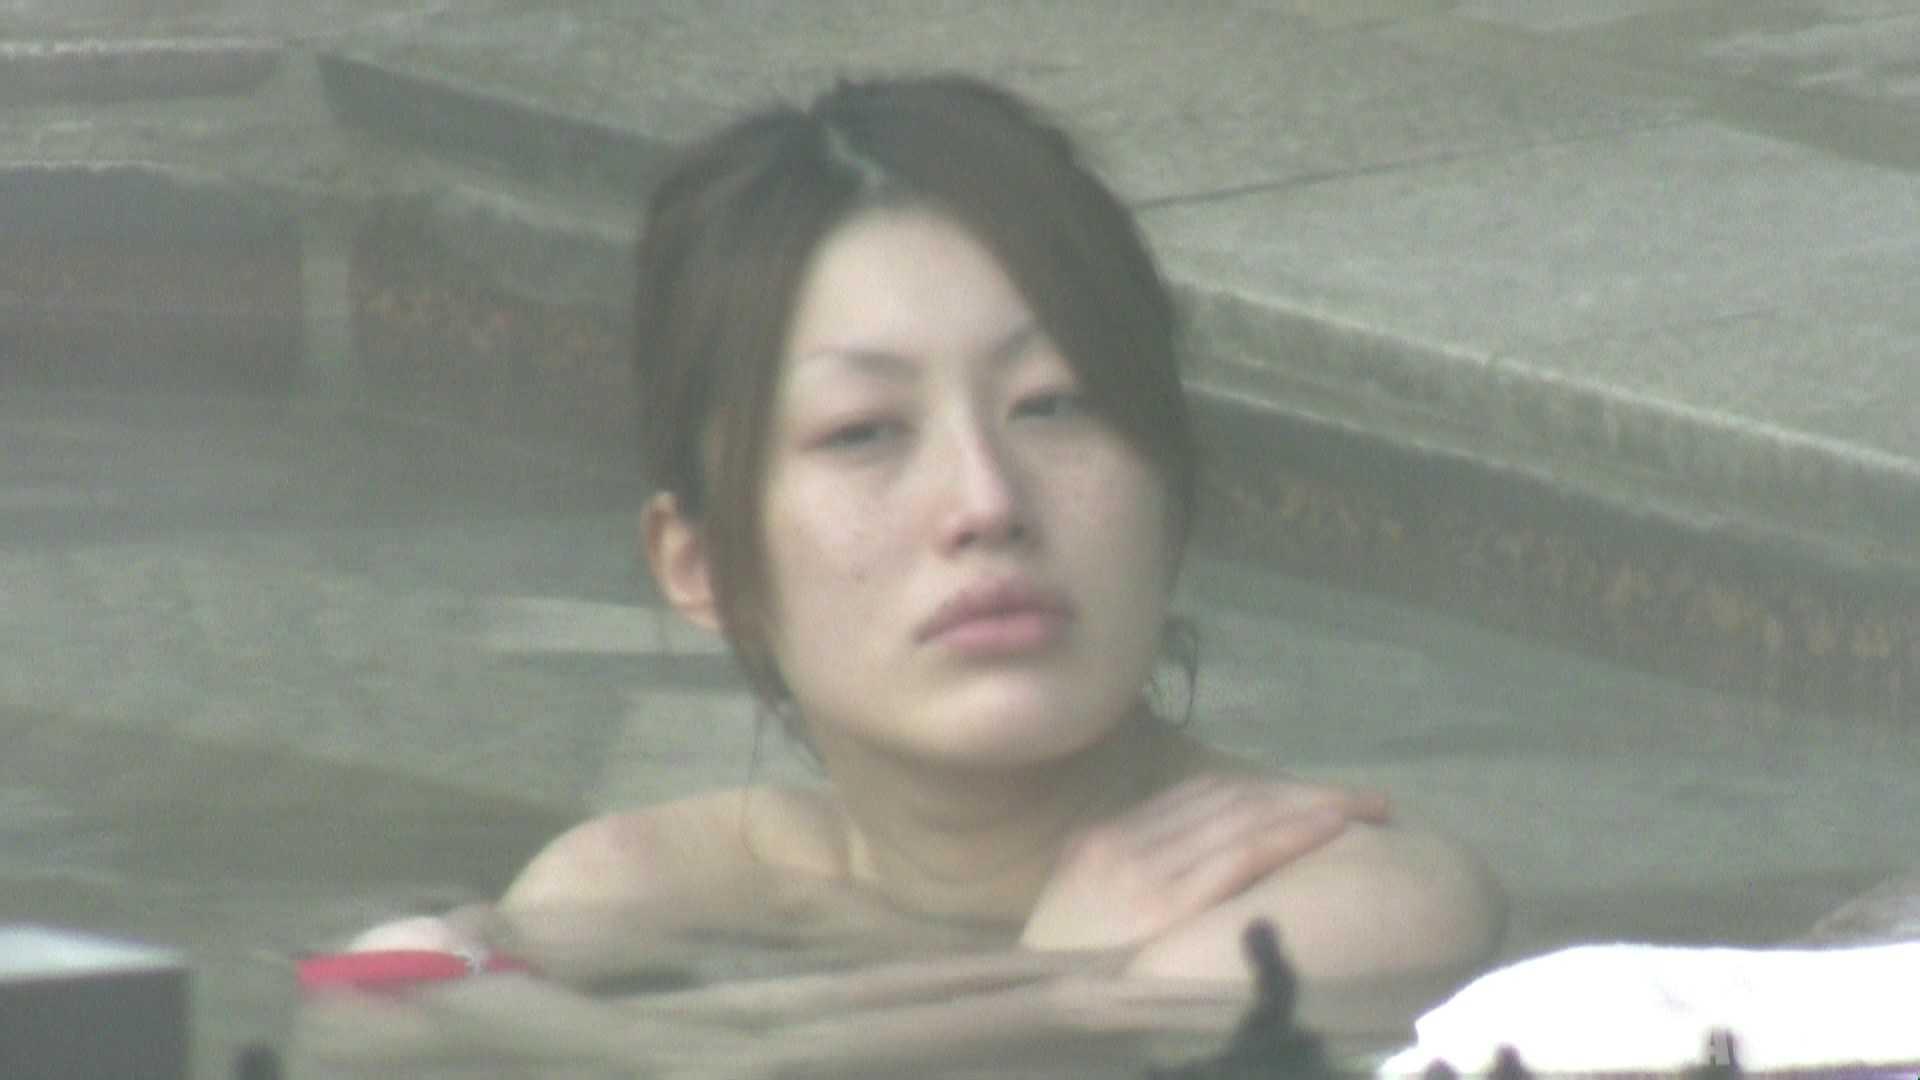 Aquaな露天風呂Vol.775 盗撮映像  74Pix 21